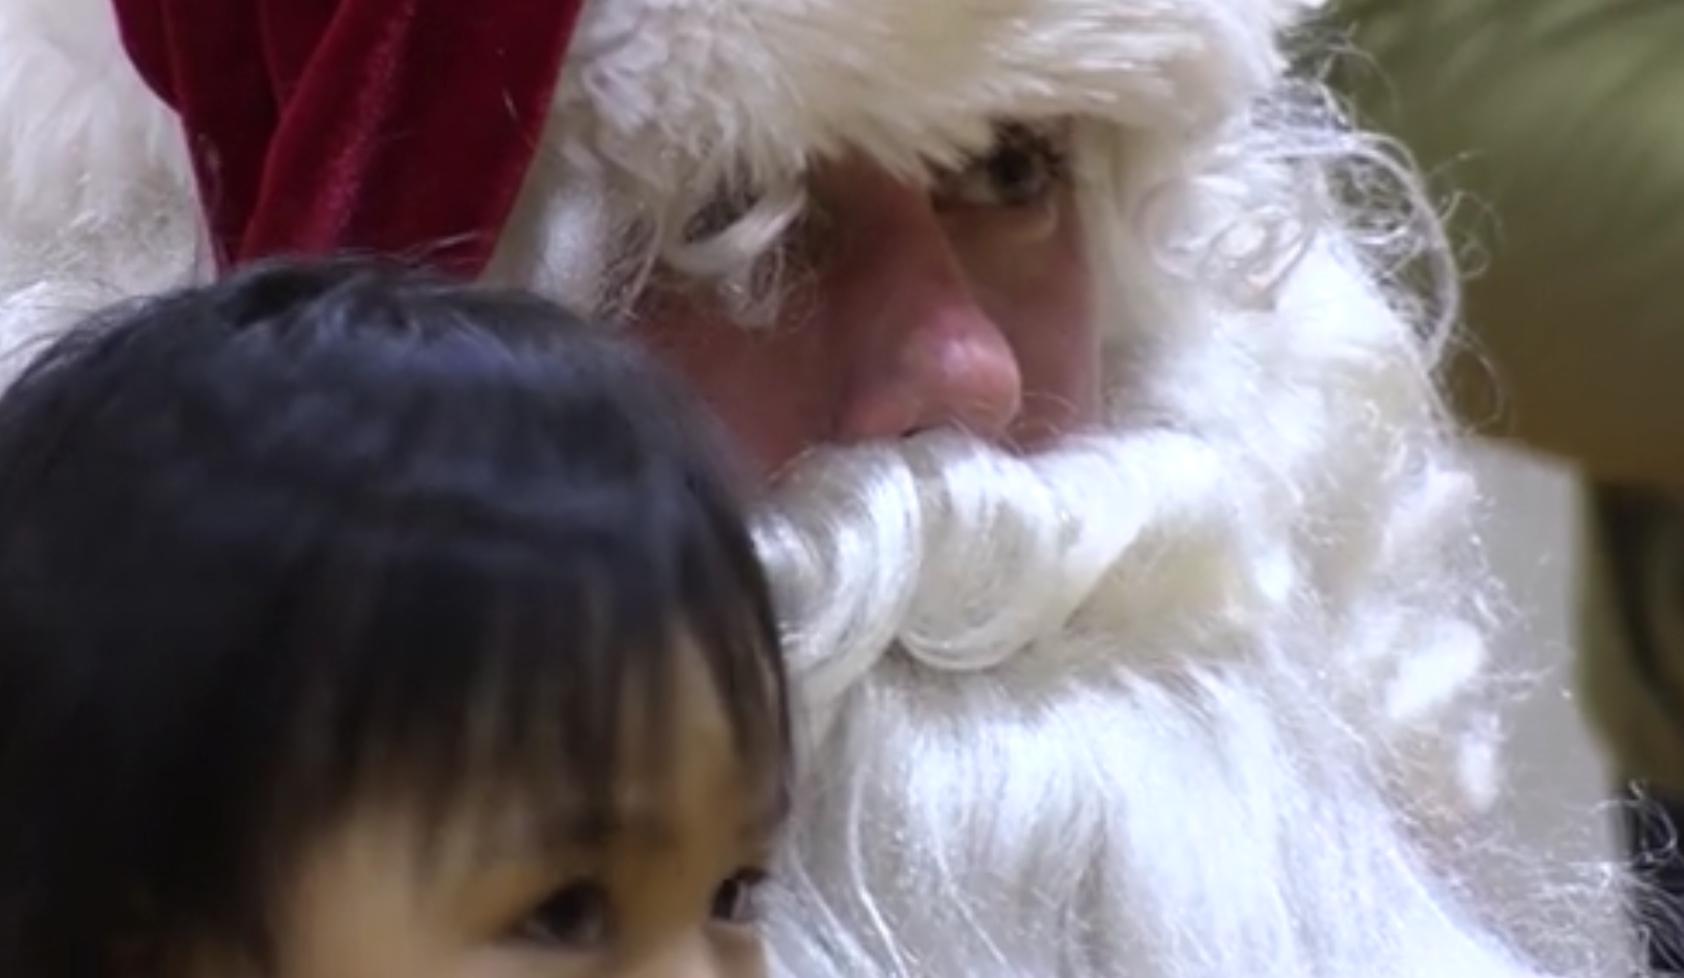 Santa visiting with children in rural Alaska. Image-USMC